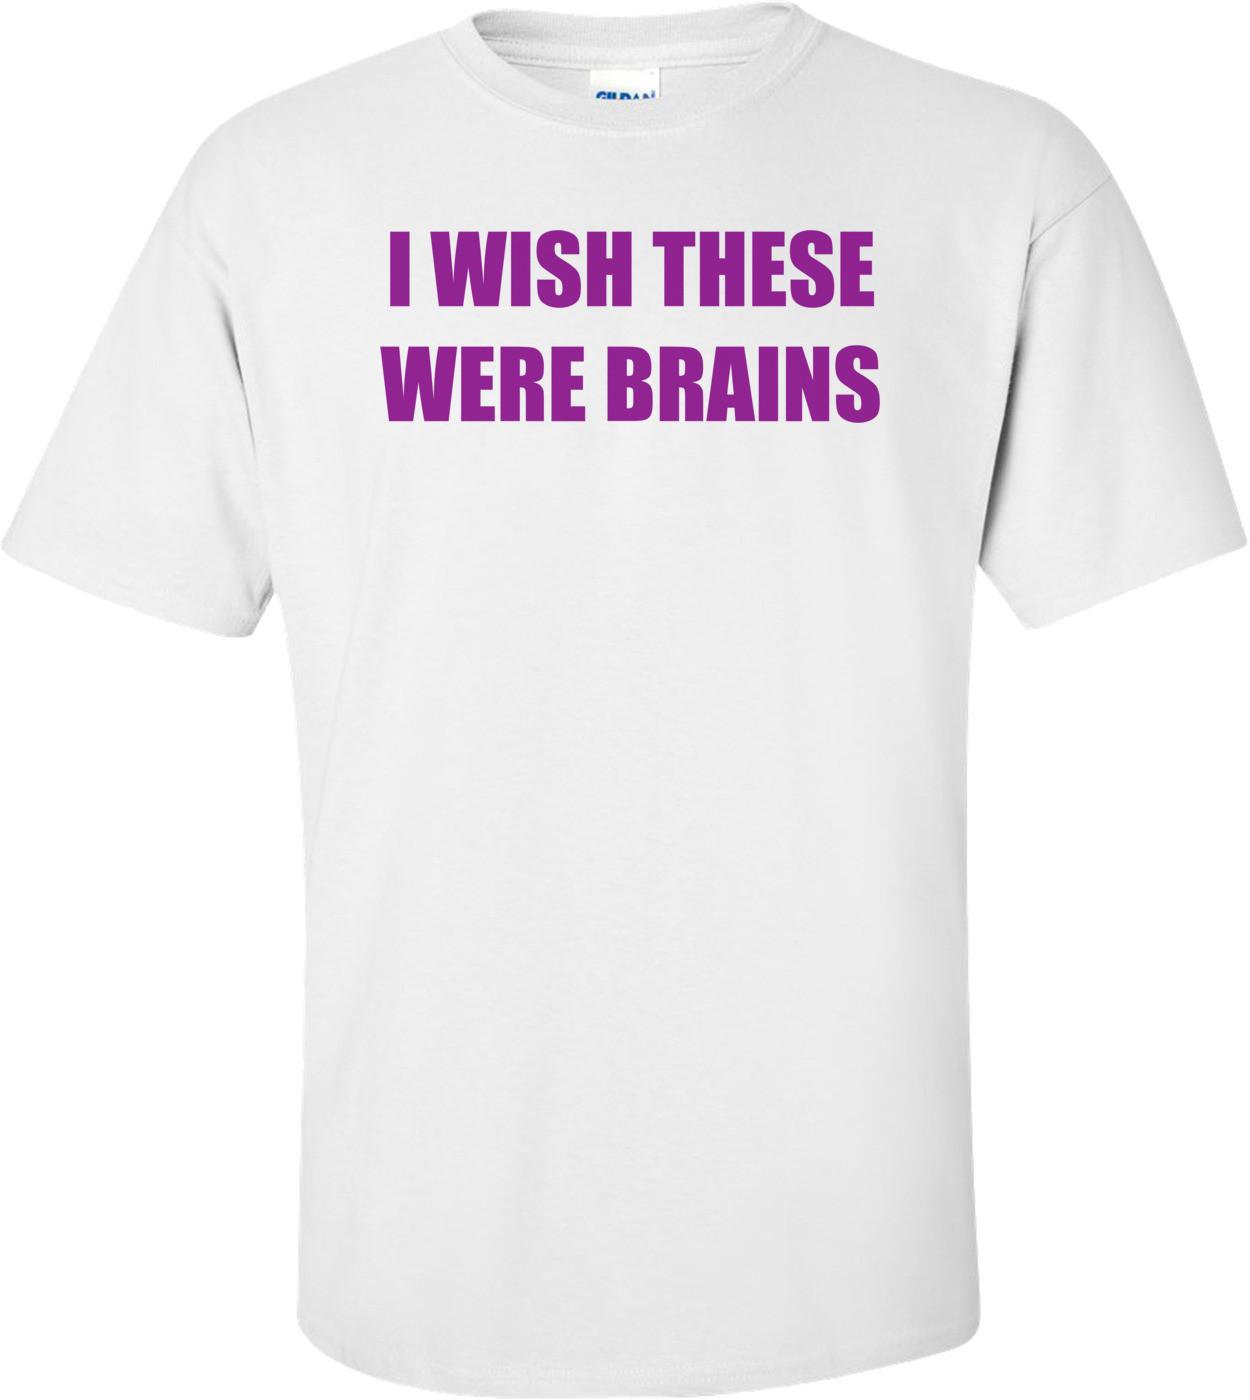 I Wish These Were Brains Shirt